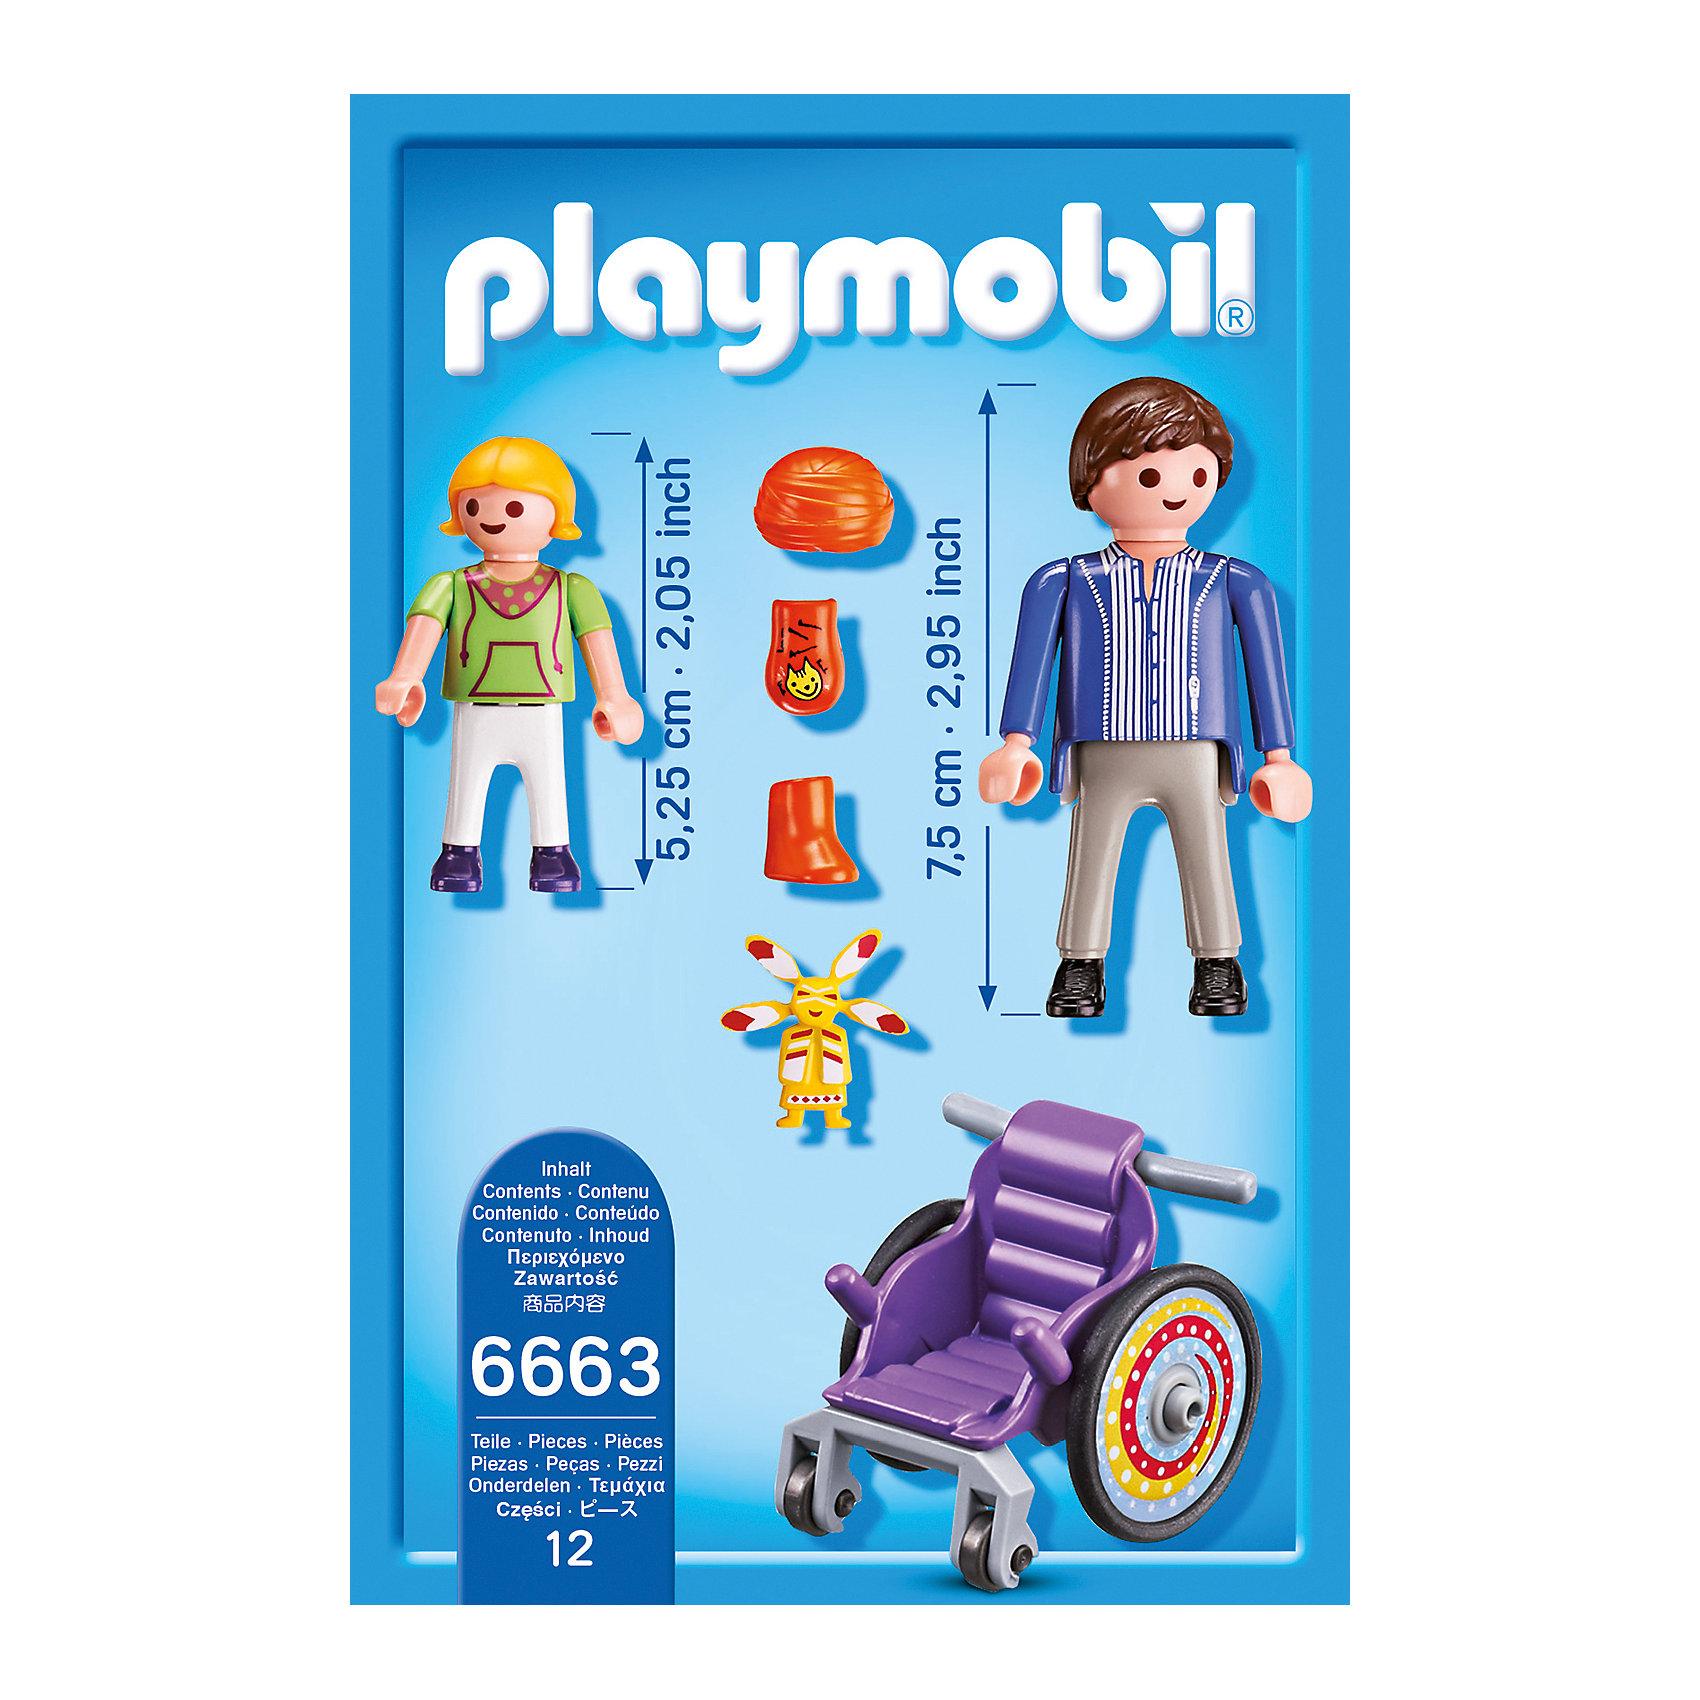 ������� �������: ������� � �������, PLAYMOBIL (PLAYMOBIL�)